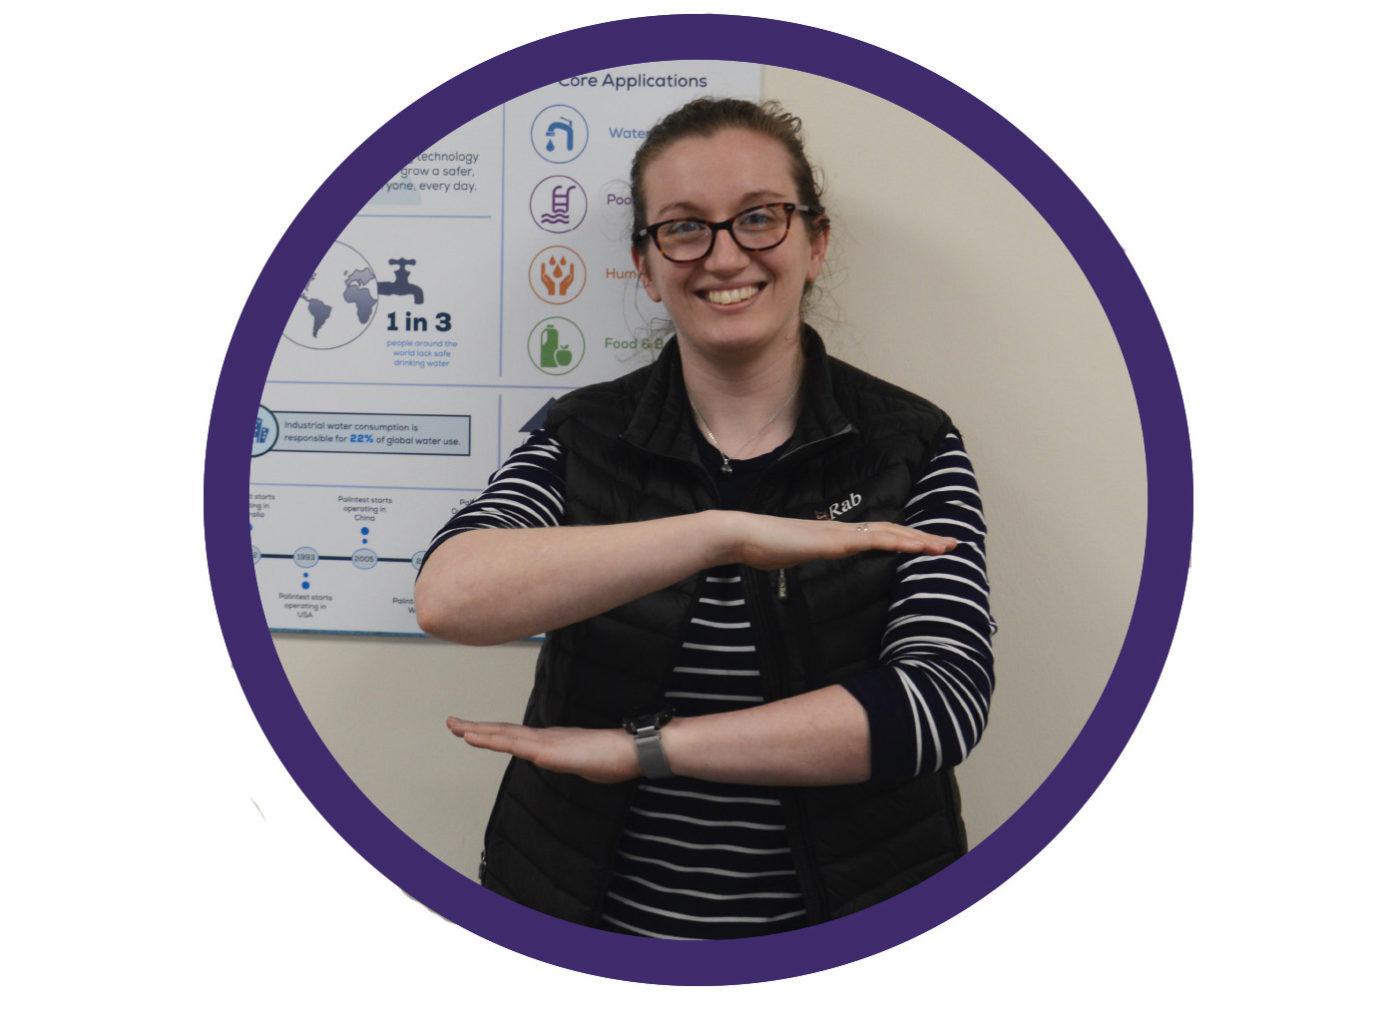 <h3>Hannah, Applications Scientist</h3>